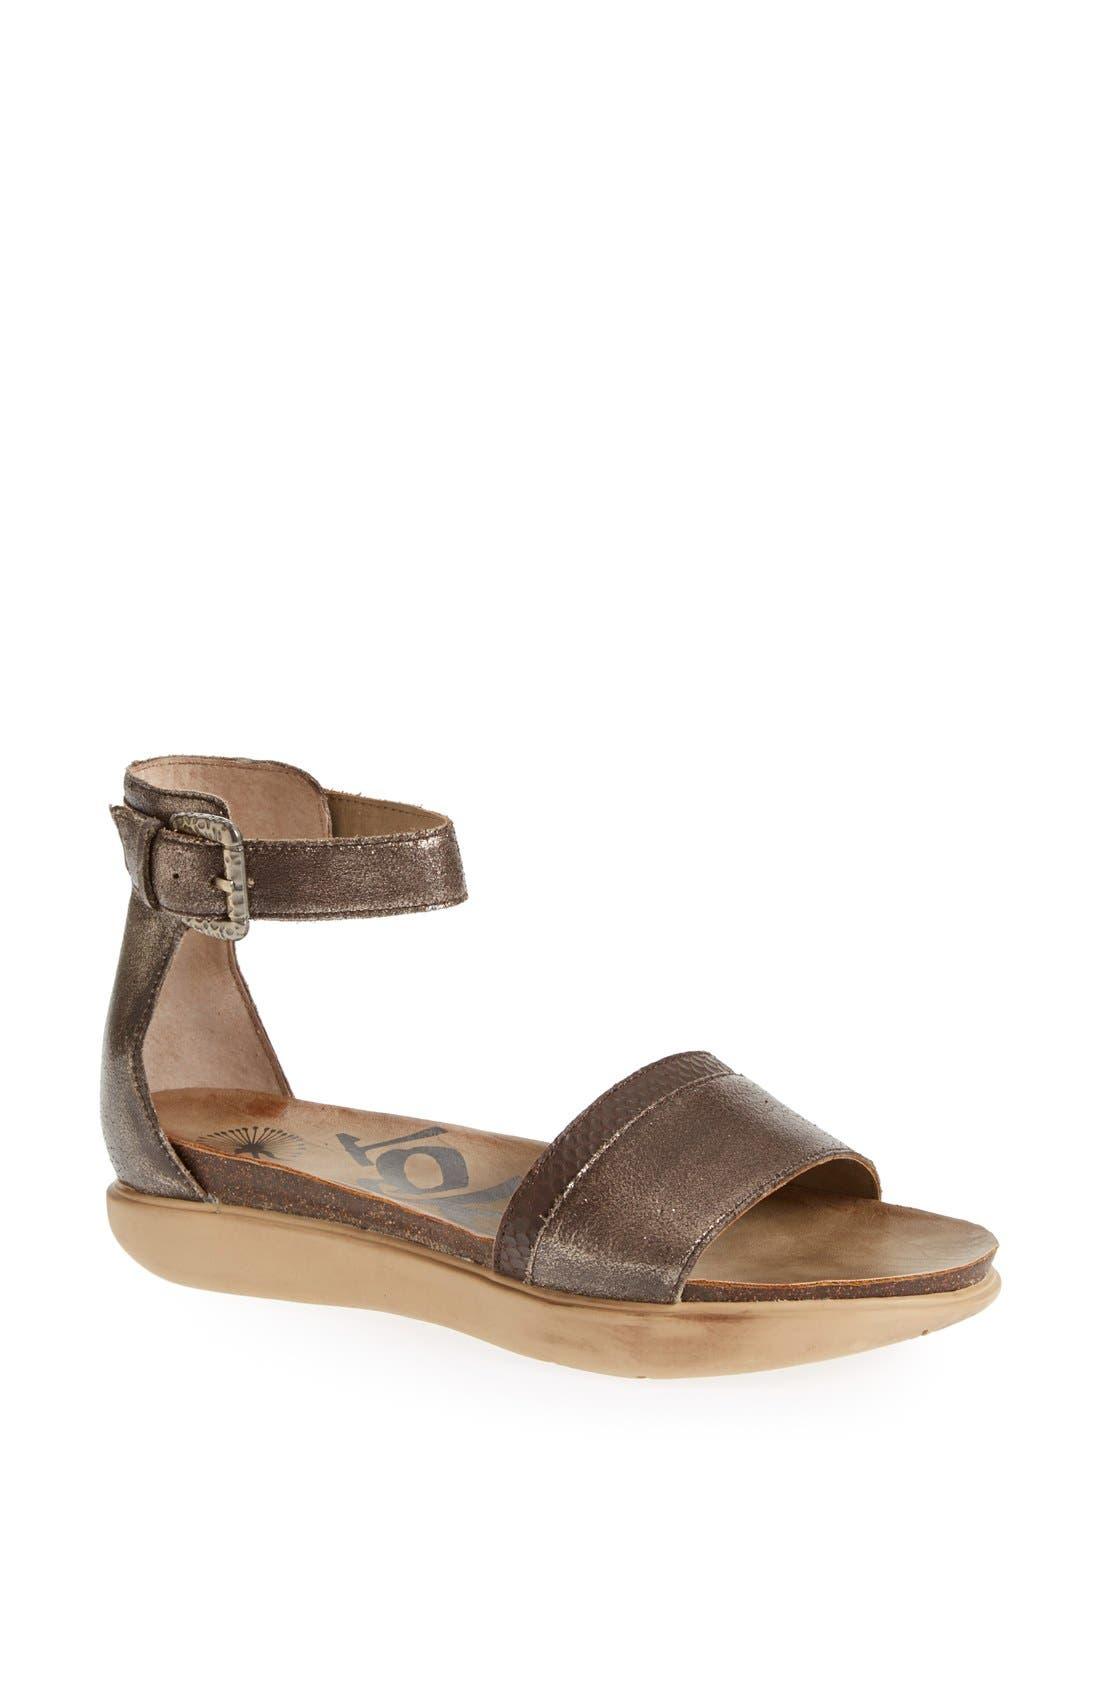 Main Image - OTBT 'Martha' Ankle Strap Sandal (Women)